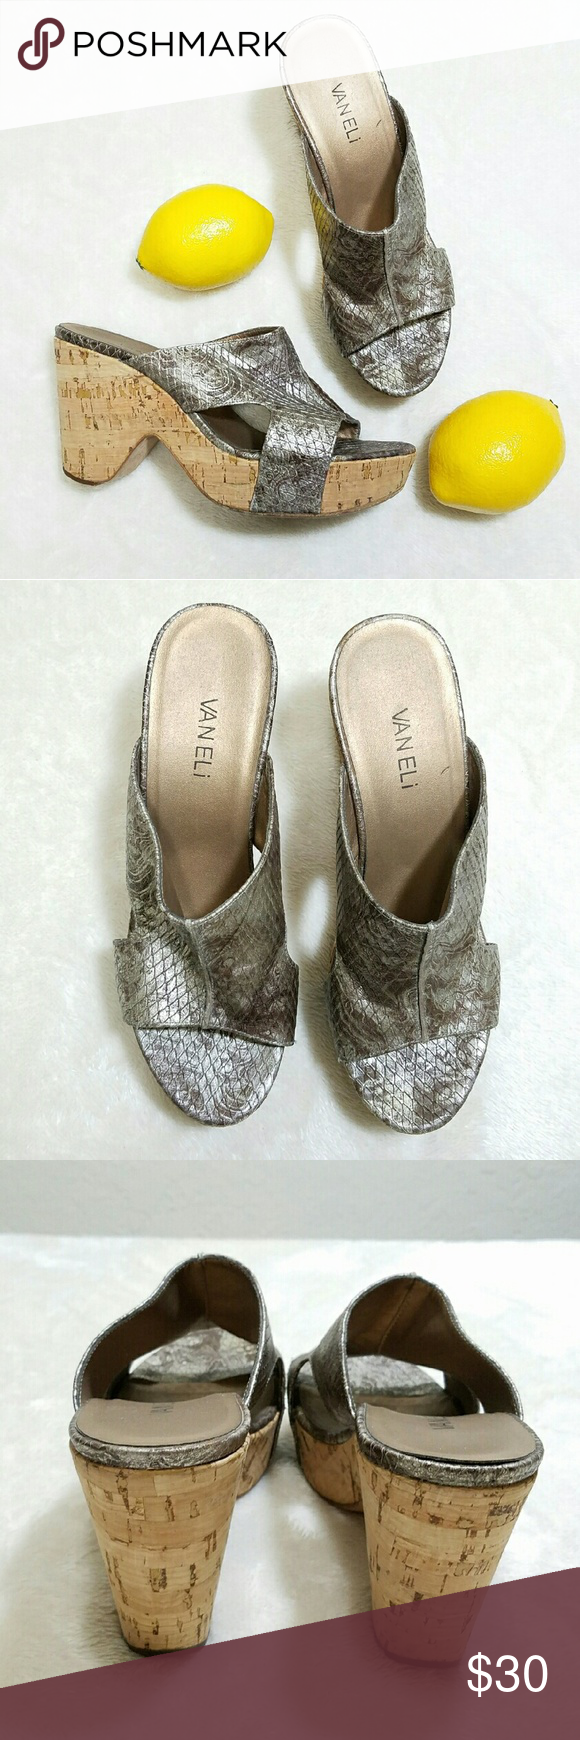 9386dd385c Van Eli Snakeskin Leather Silver Cork Wedge Heels -Excellent used  condition- slight wear on